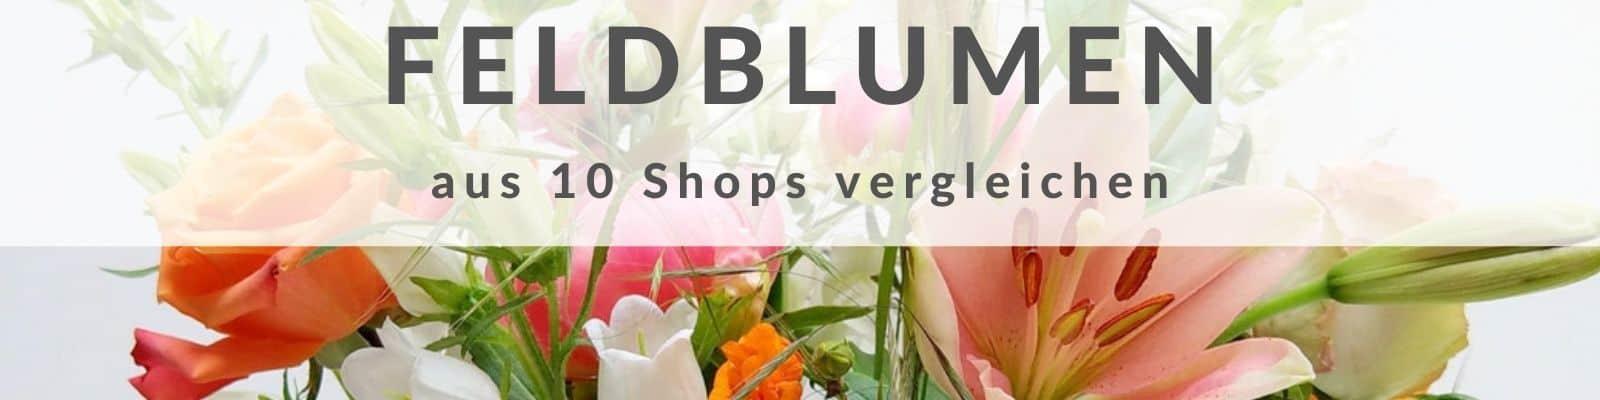 Feldblumen - Feldblumenstrauß kaufen